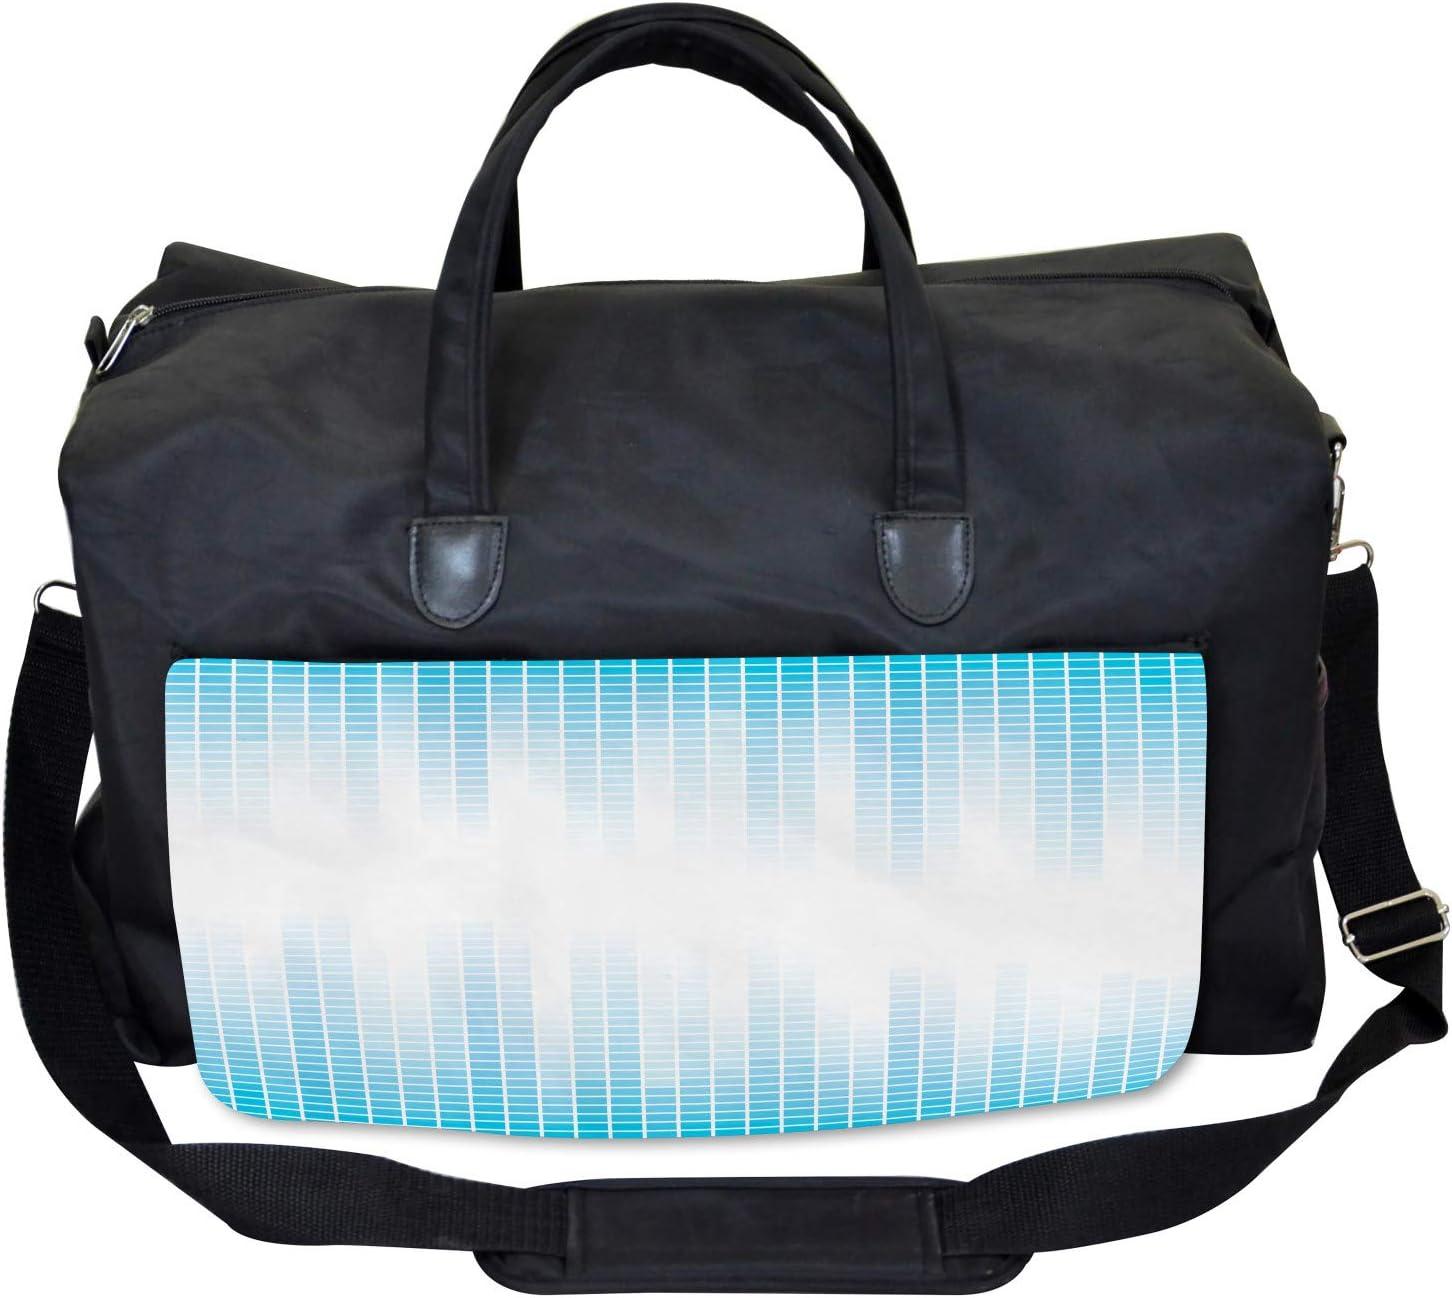 Ambesonne Modern Gym Bag Geometric Squared Design Large Weekender Carry-on